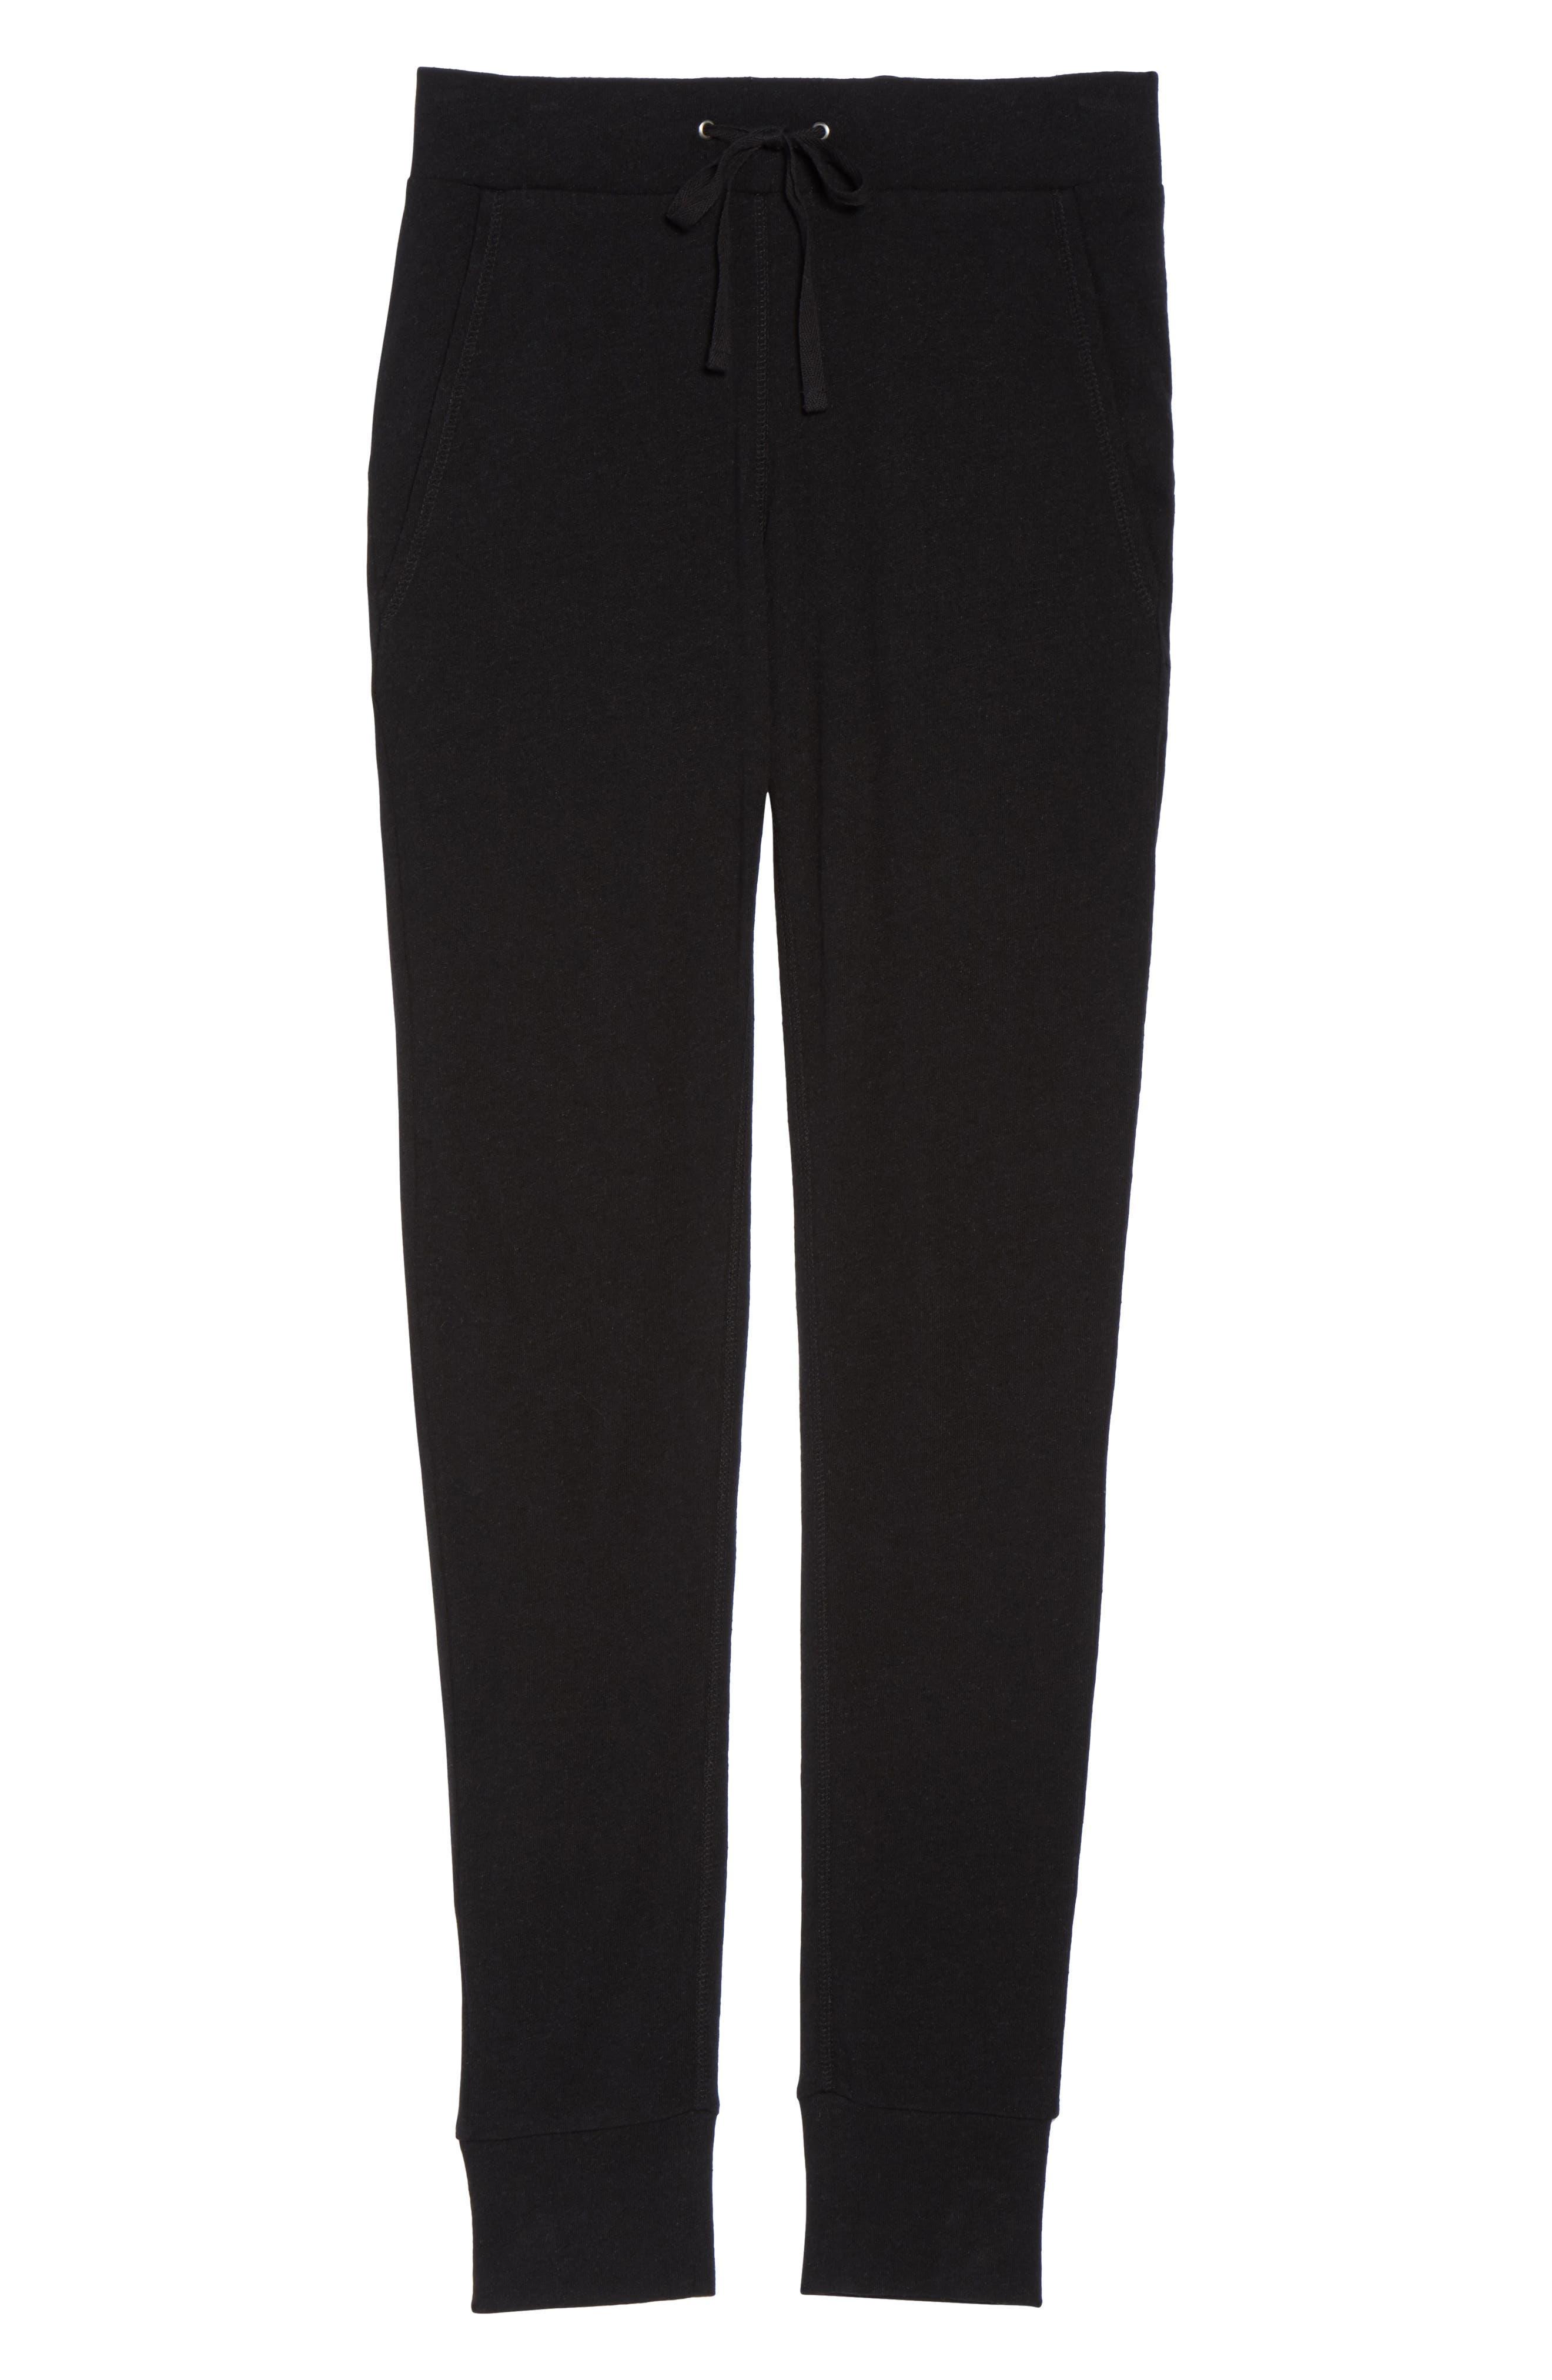 Clementine Cotton & Silk Pajama Pants,                             Alternate thumbnail 5, color,                             Black